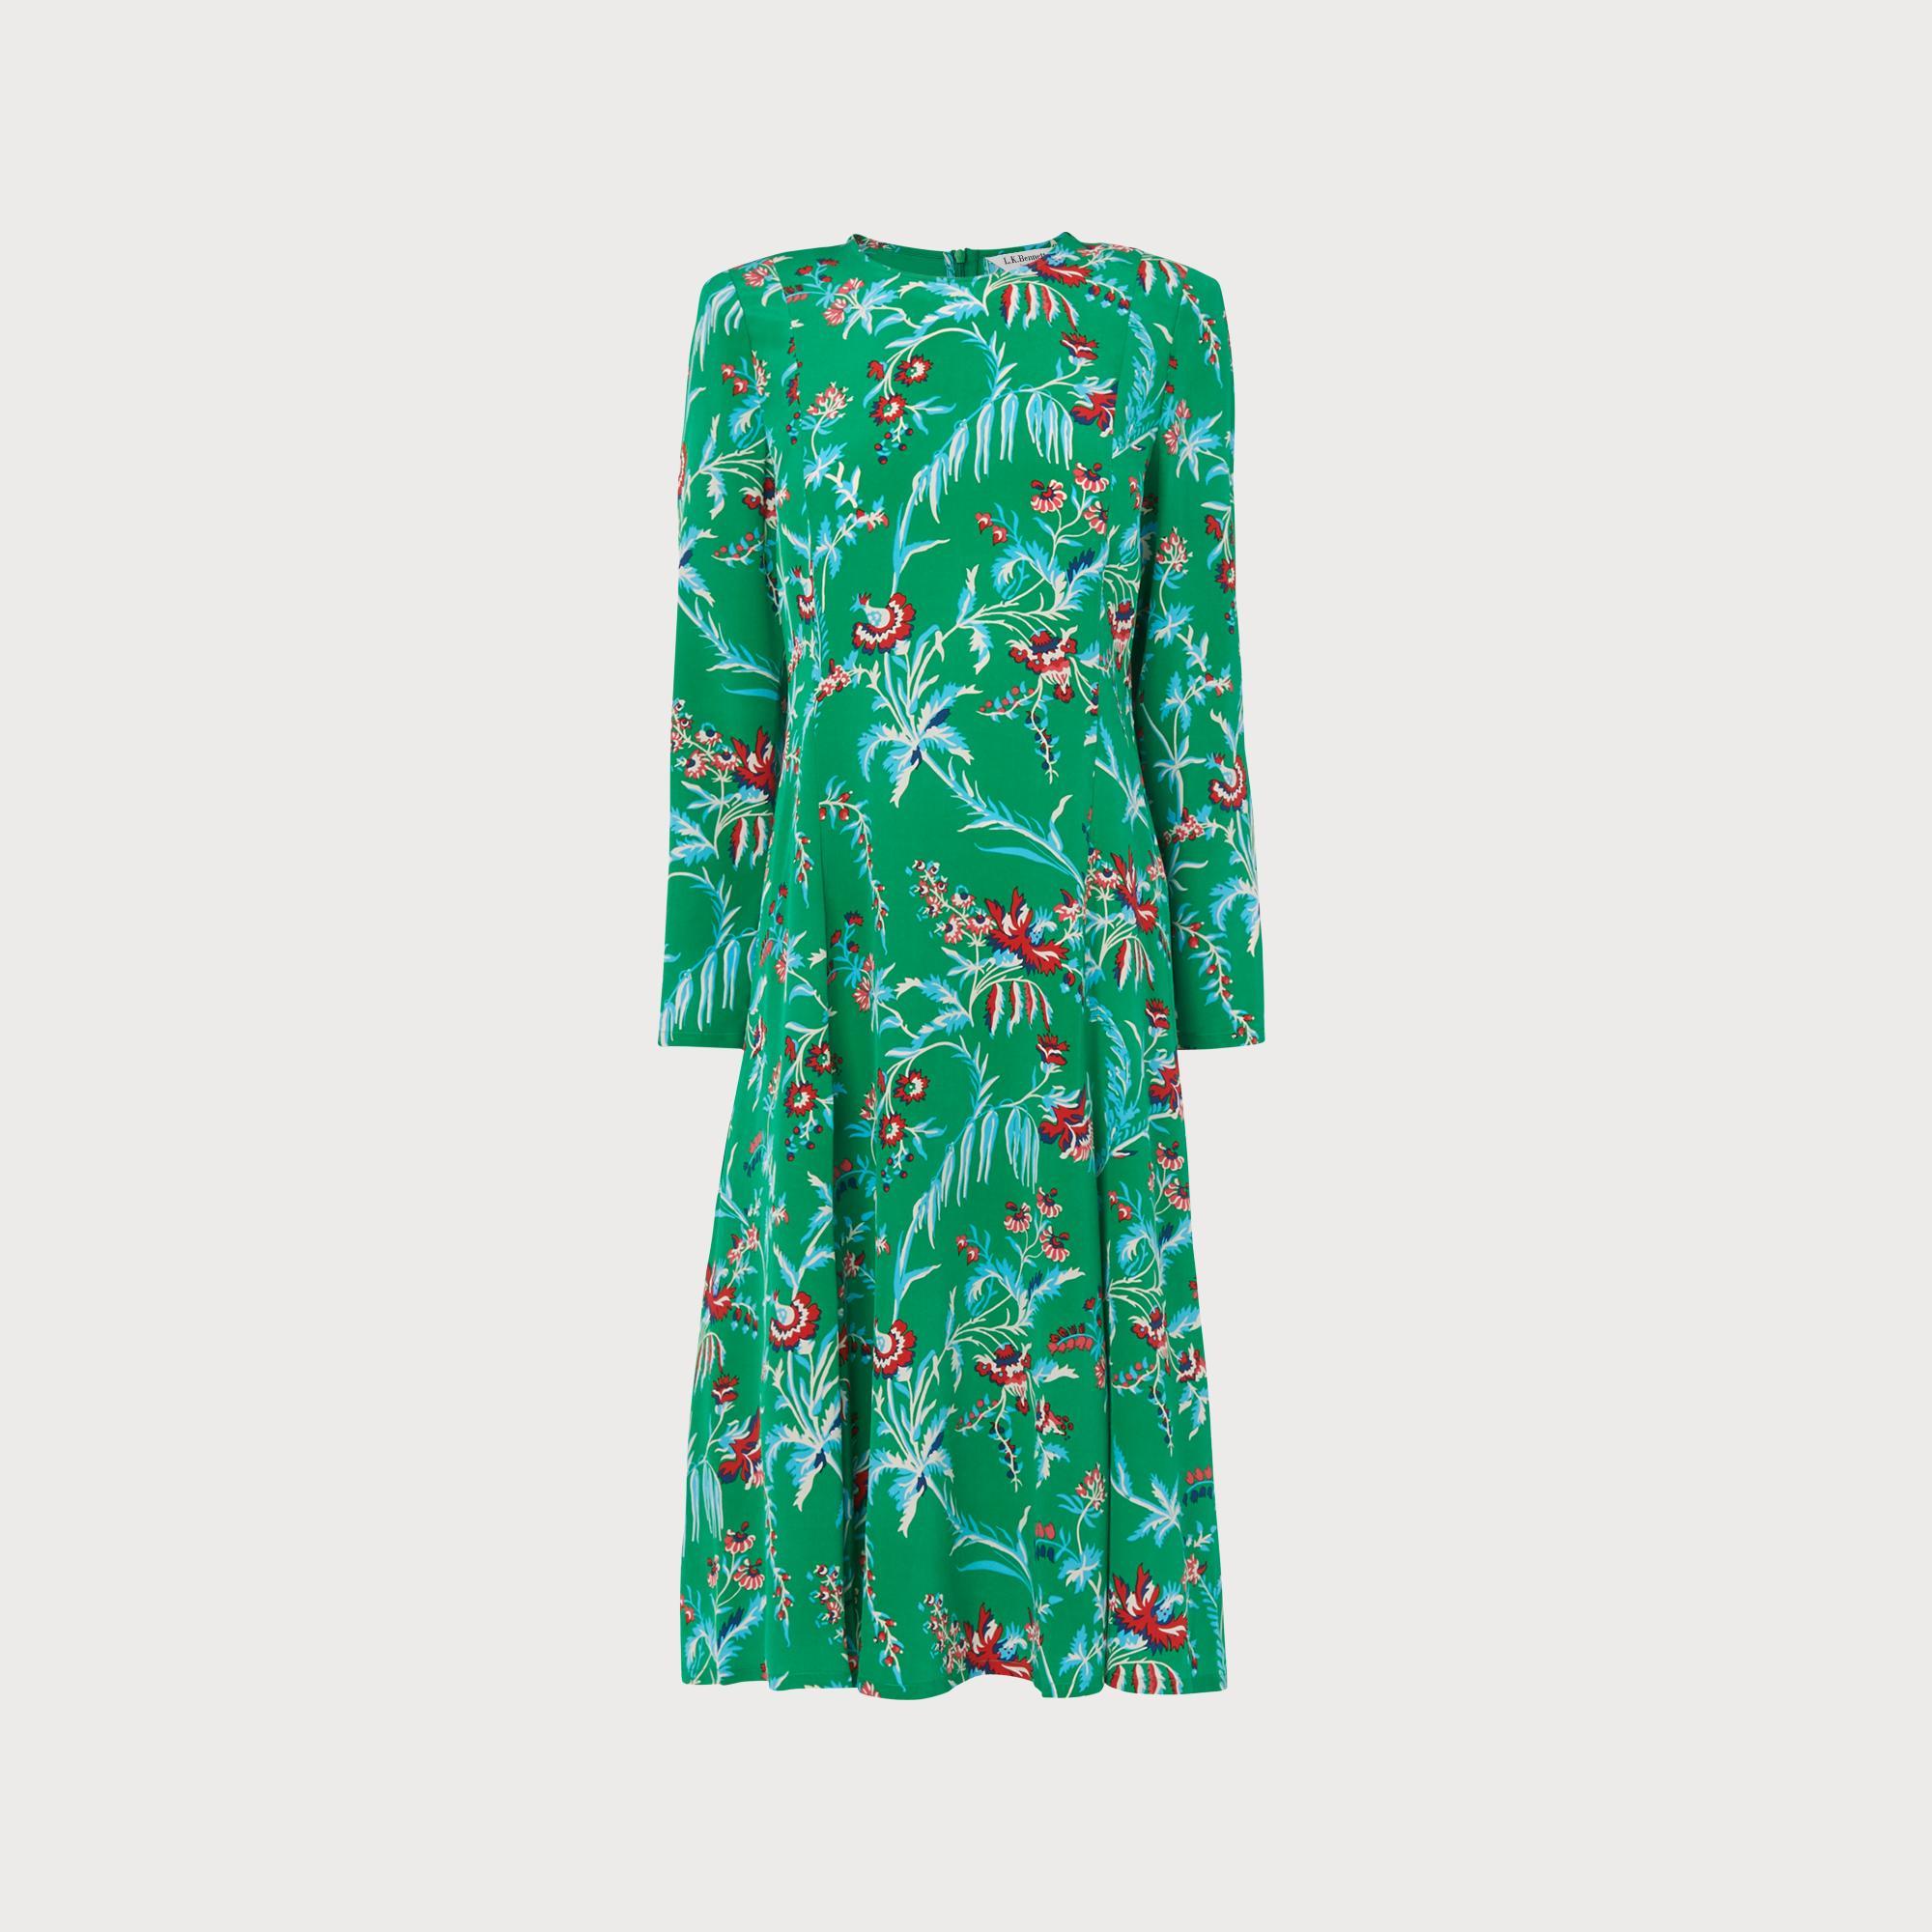 b5f16c5e656c Leanie Wildflower Print Green Silk Midi Dress | Clothing | L.K.Bennett